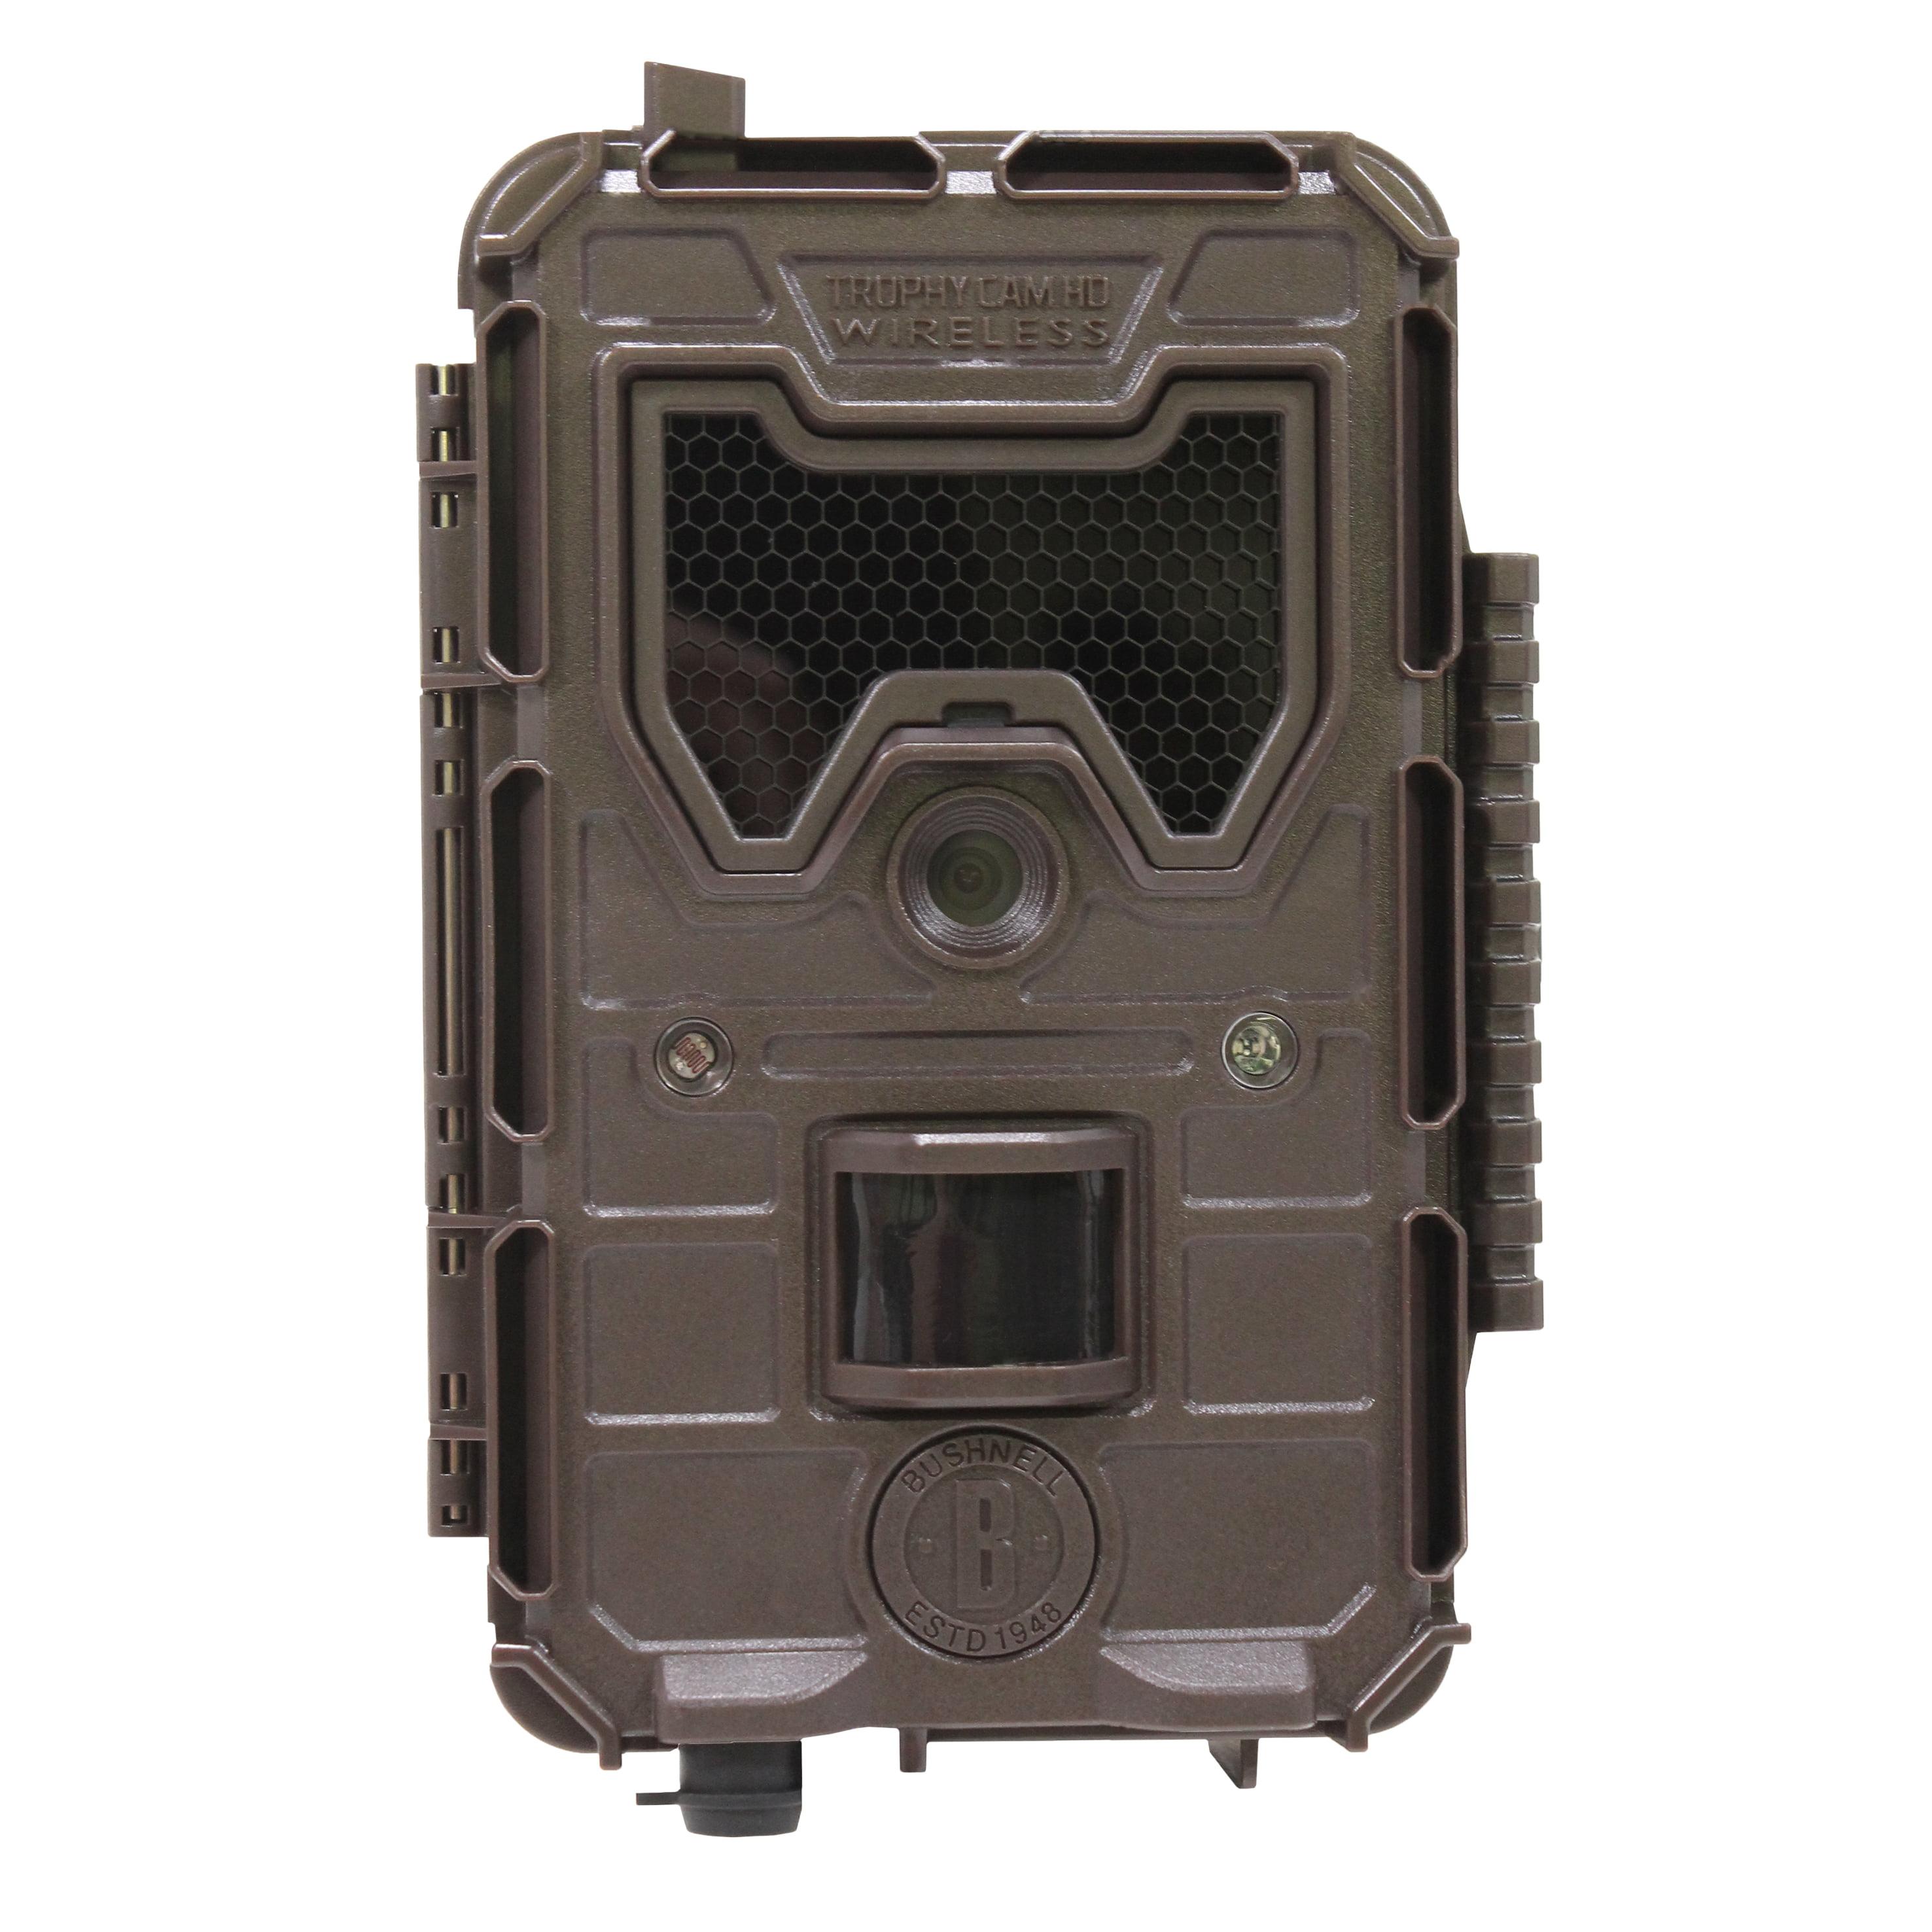 Bushnell Trophy Cam Aggressor HD Camera - Infrared Wirele...